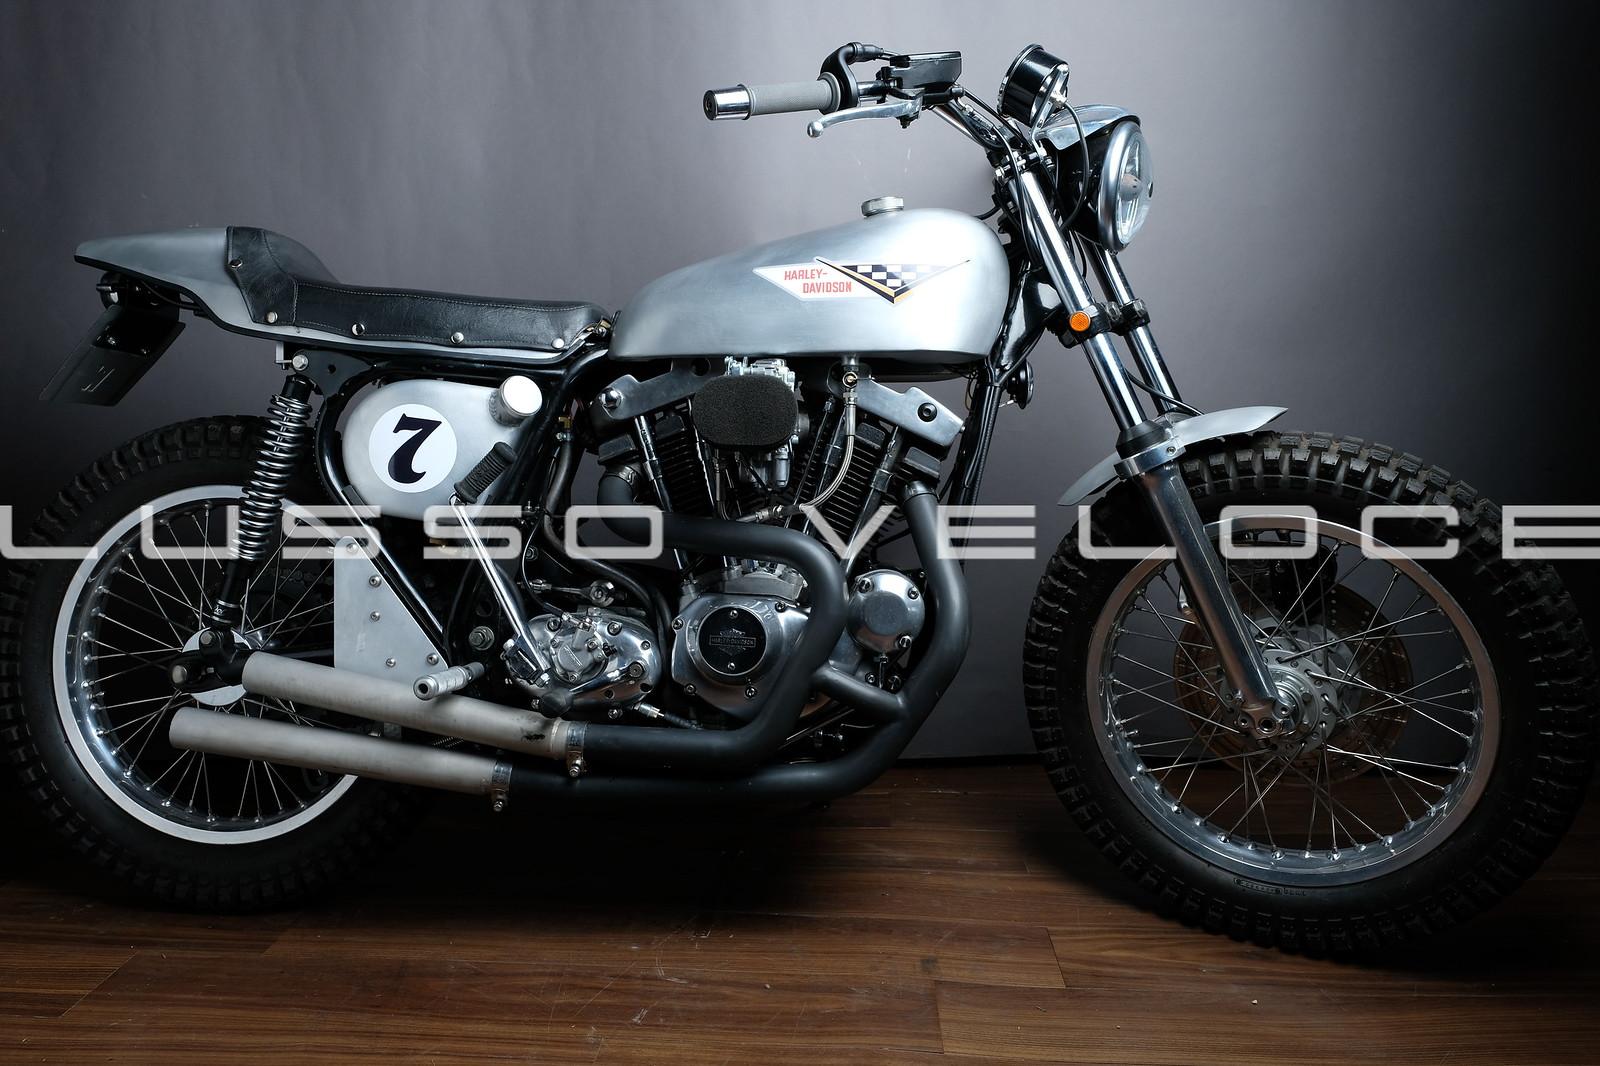 Harley Davidson Flat track special